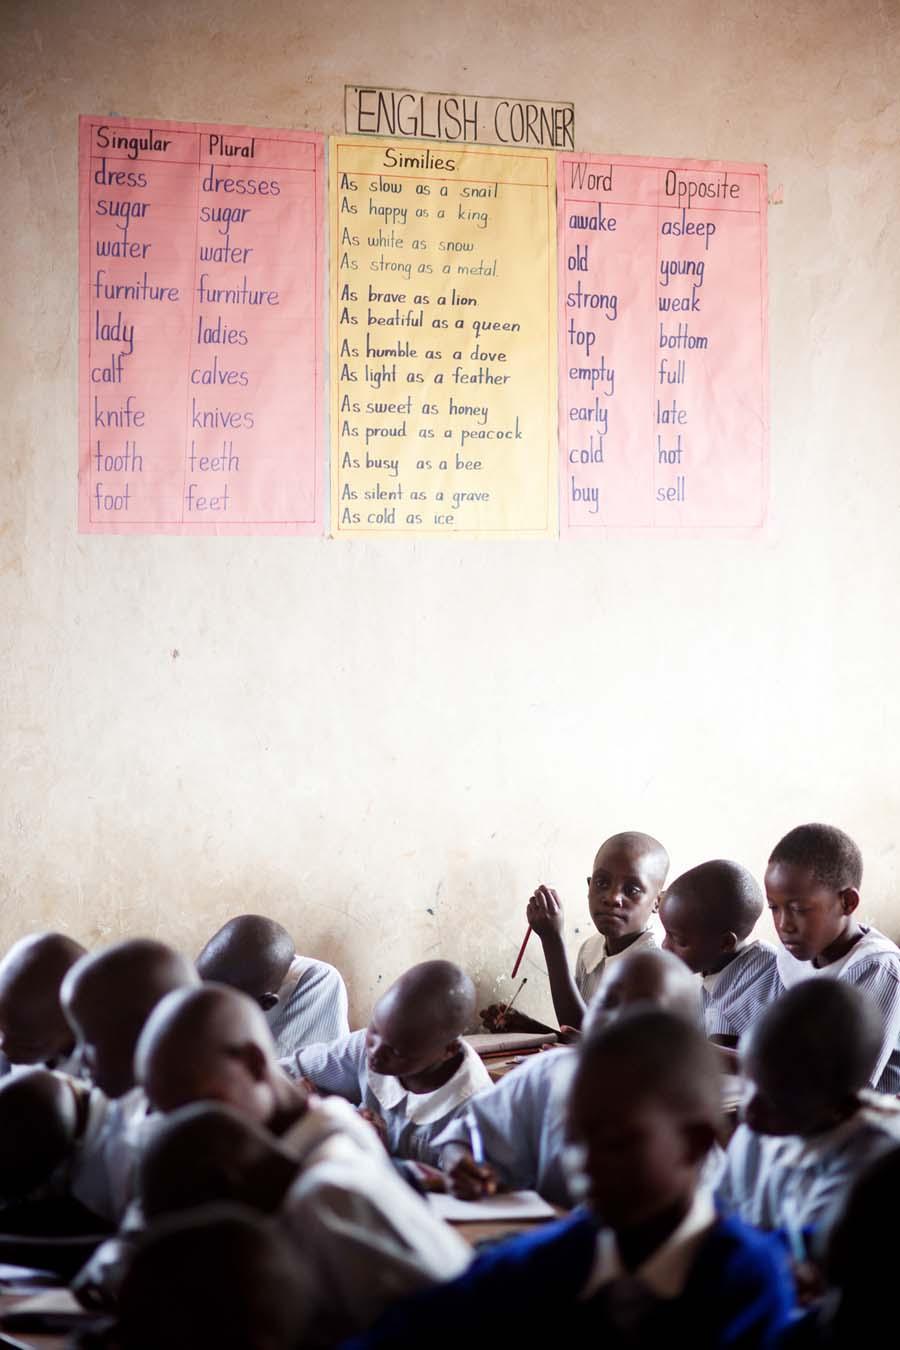 jessicadavisphotography.com | Jessica Davis Photography | Portrait Work in Uganda| Travel Photographer | World Event Photographs 3 (8).jpg